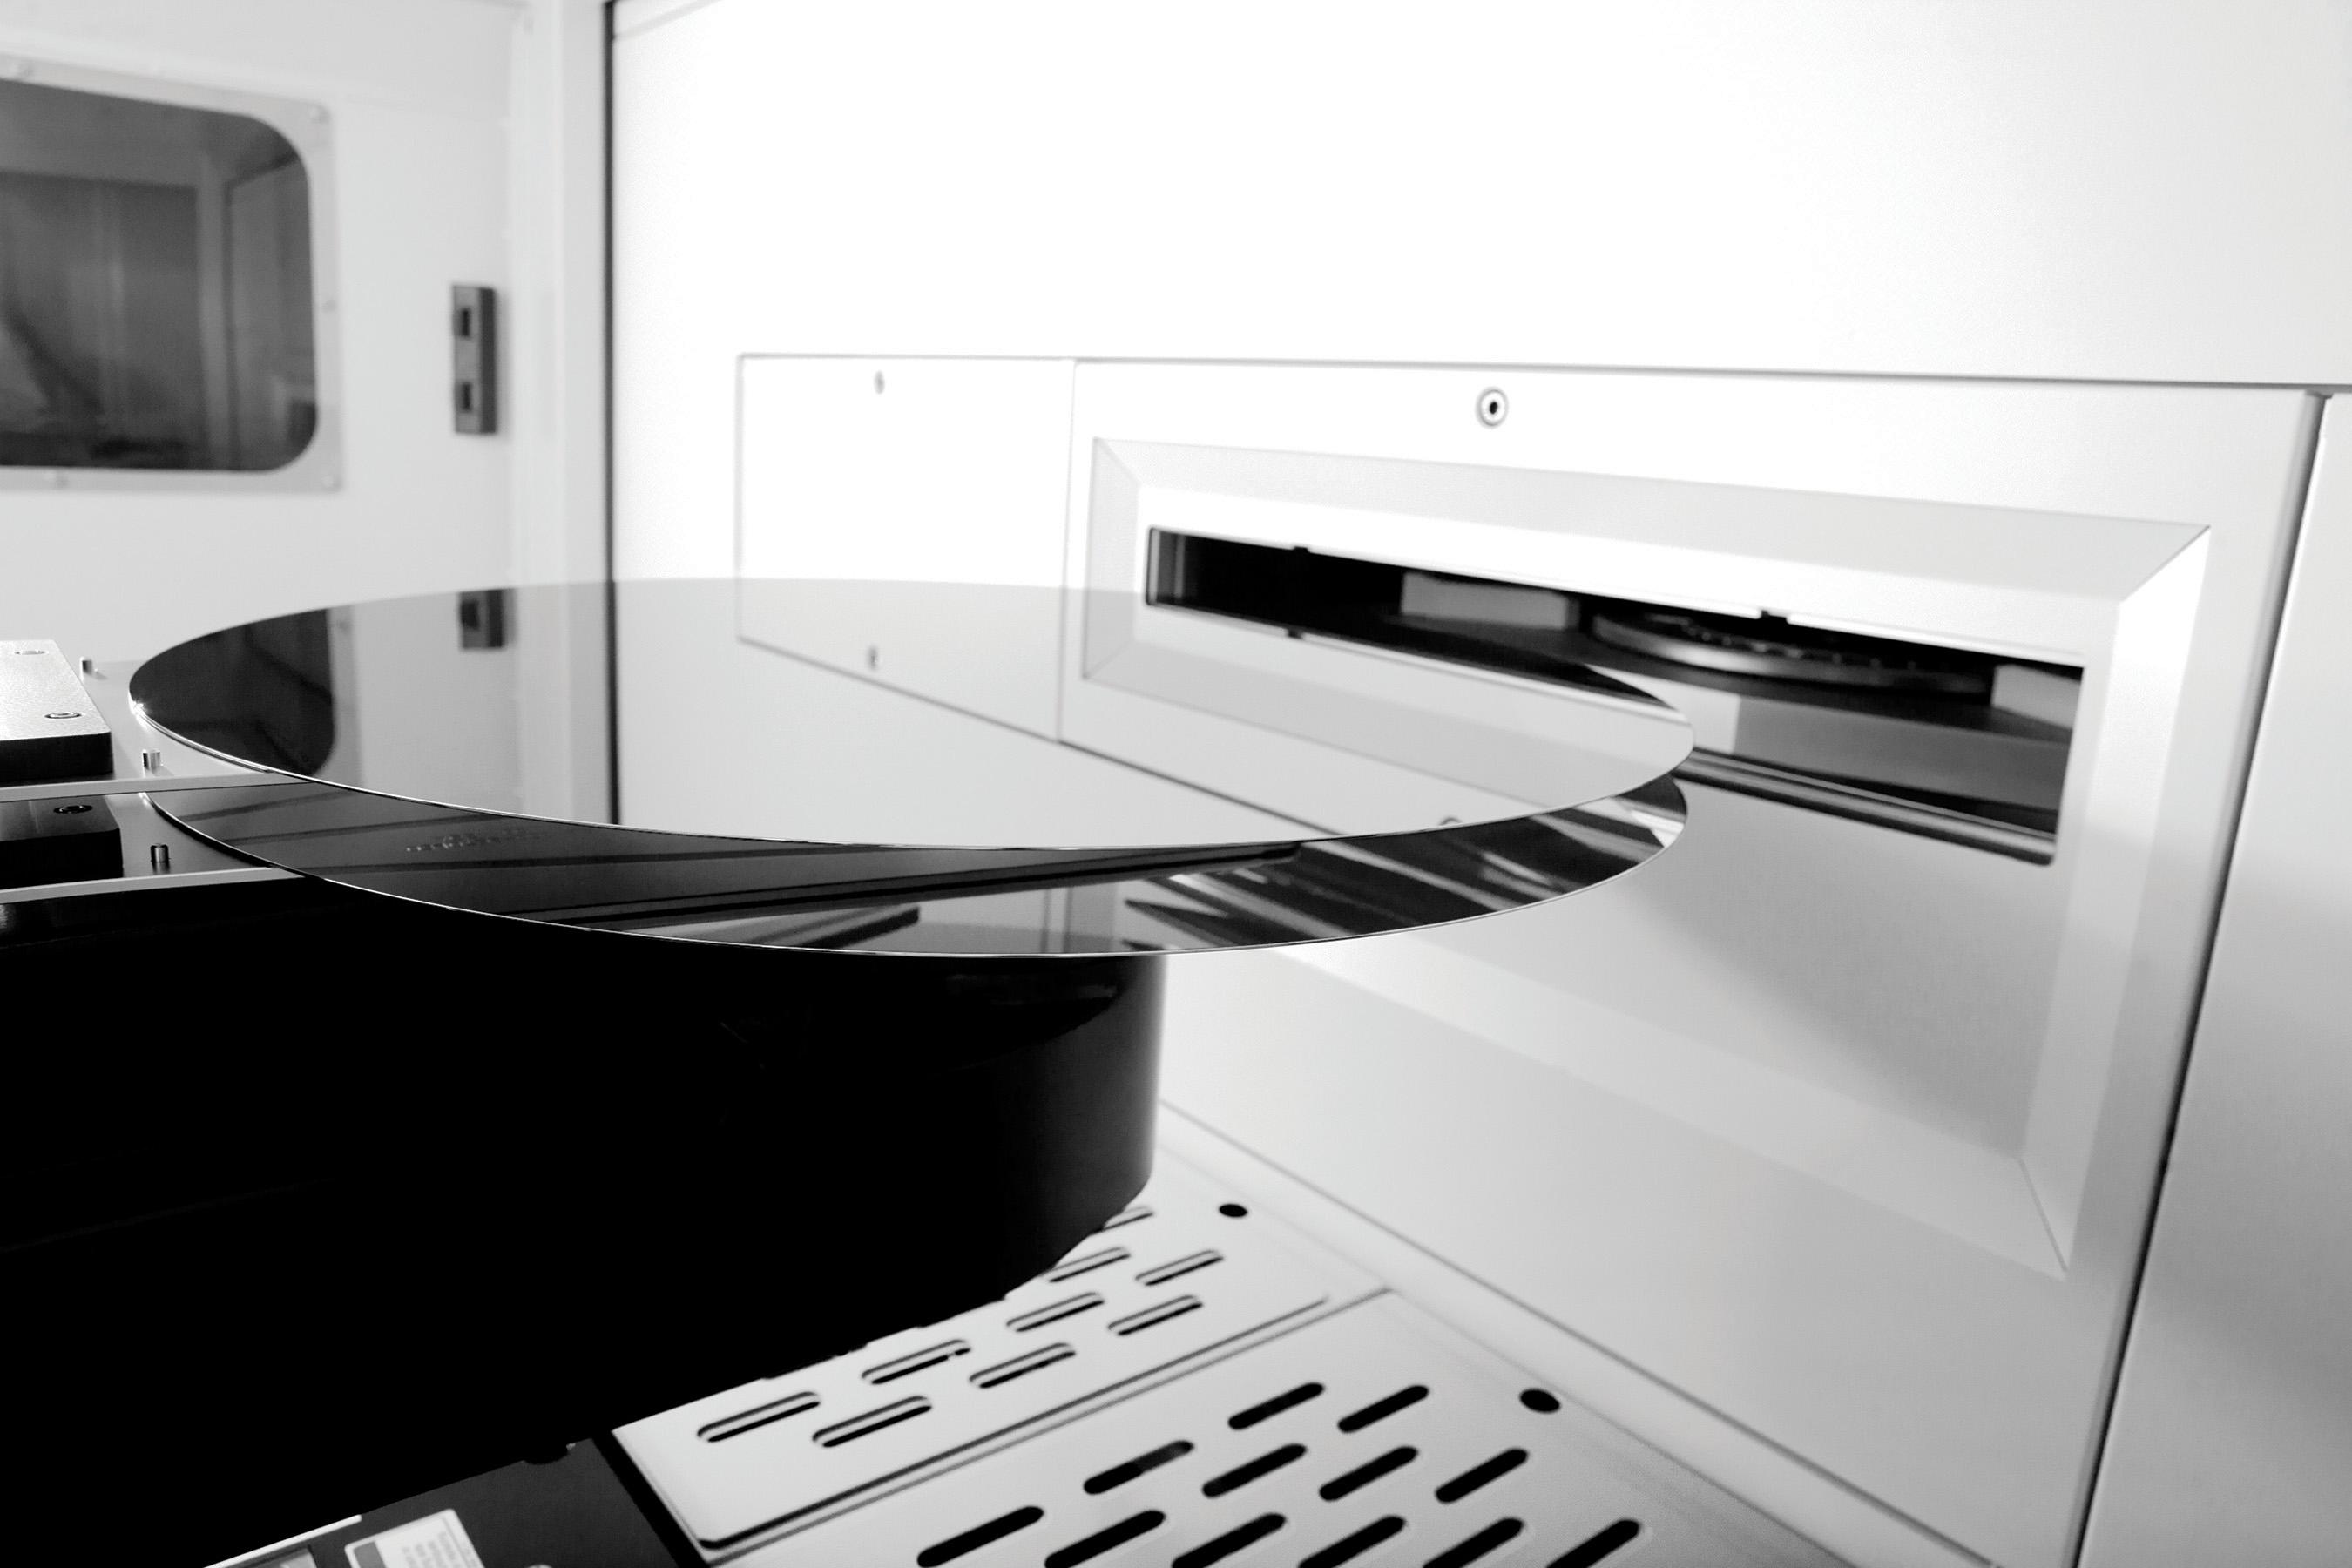 Kla Tencor Introduces Inspection And Review Portfolio For